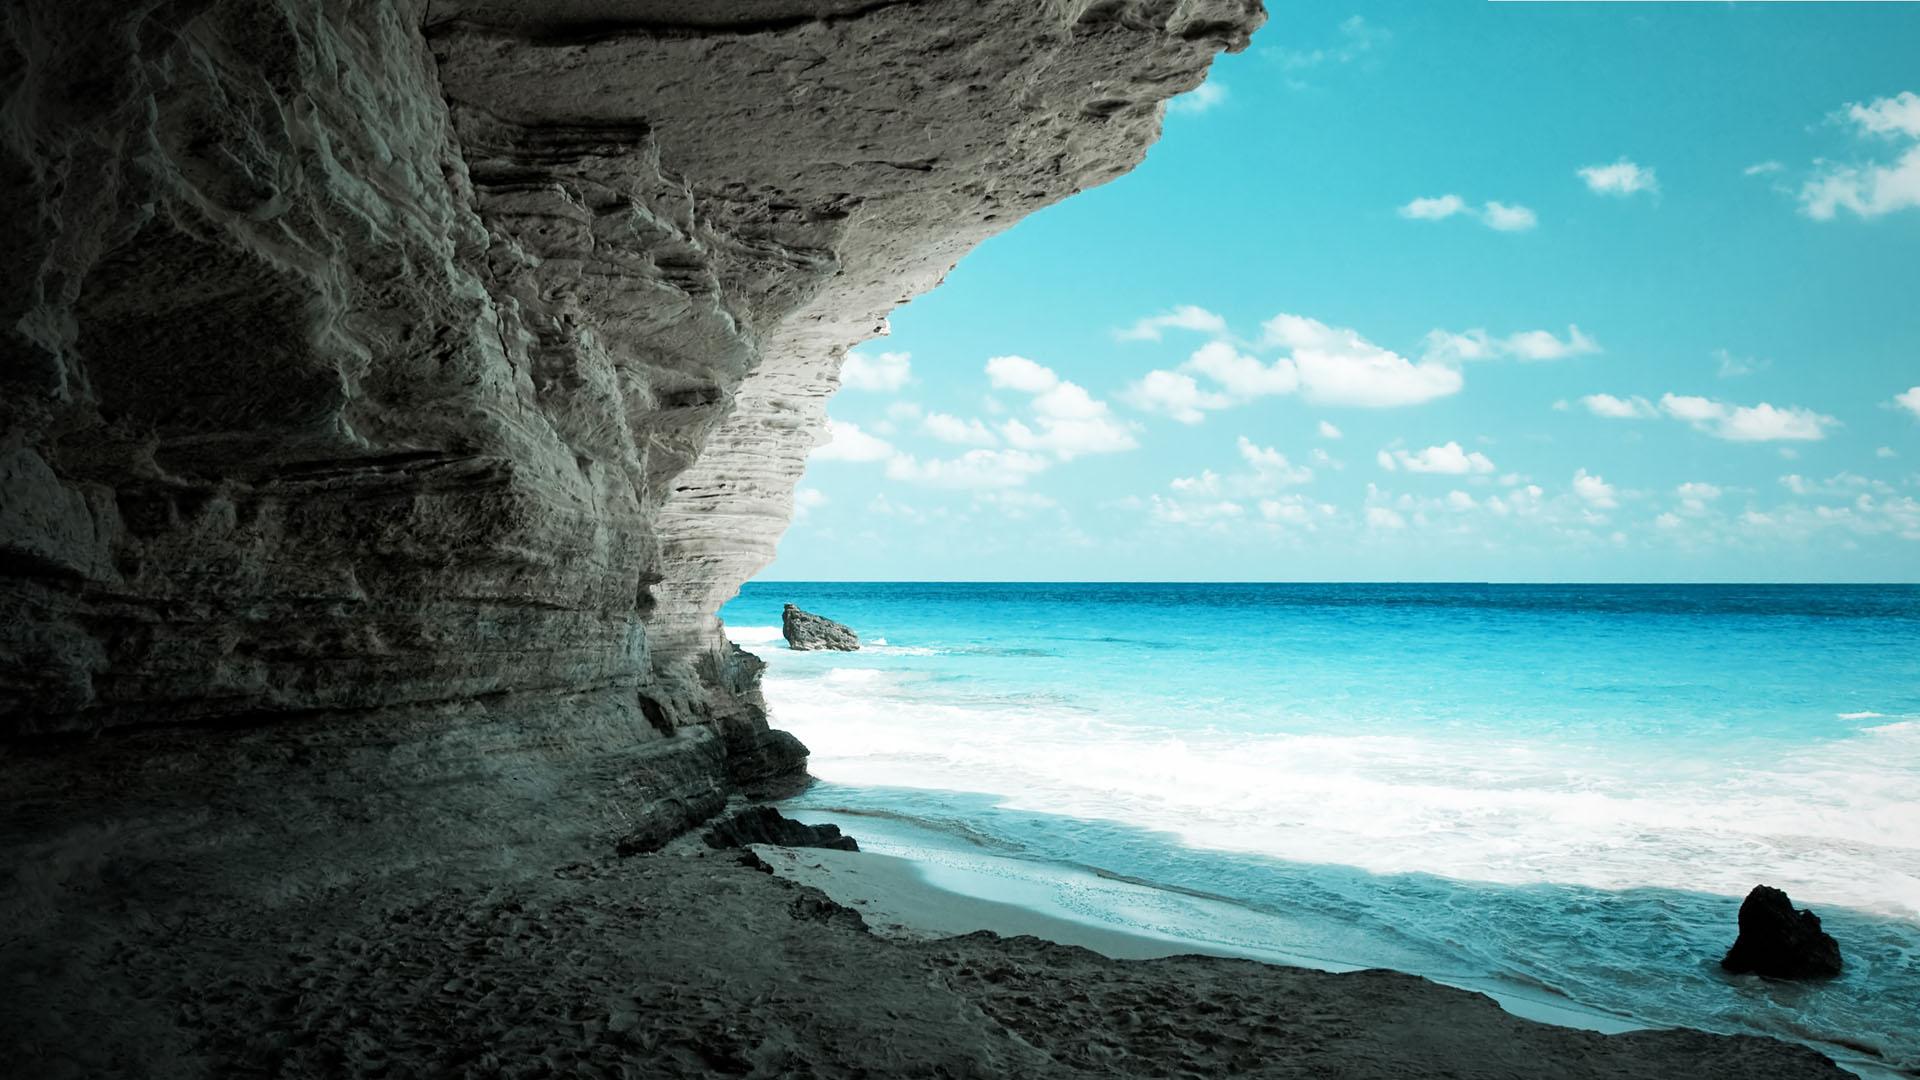 hd Beach Wallpapers 1080p HD wallpaper background 1920x1080